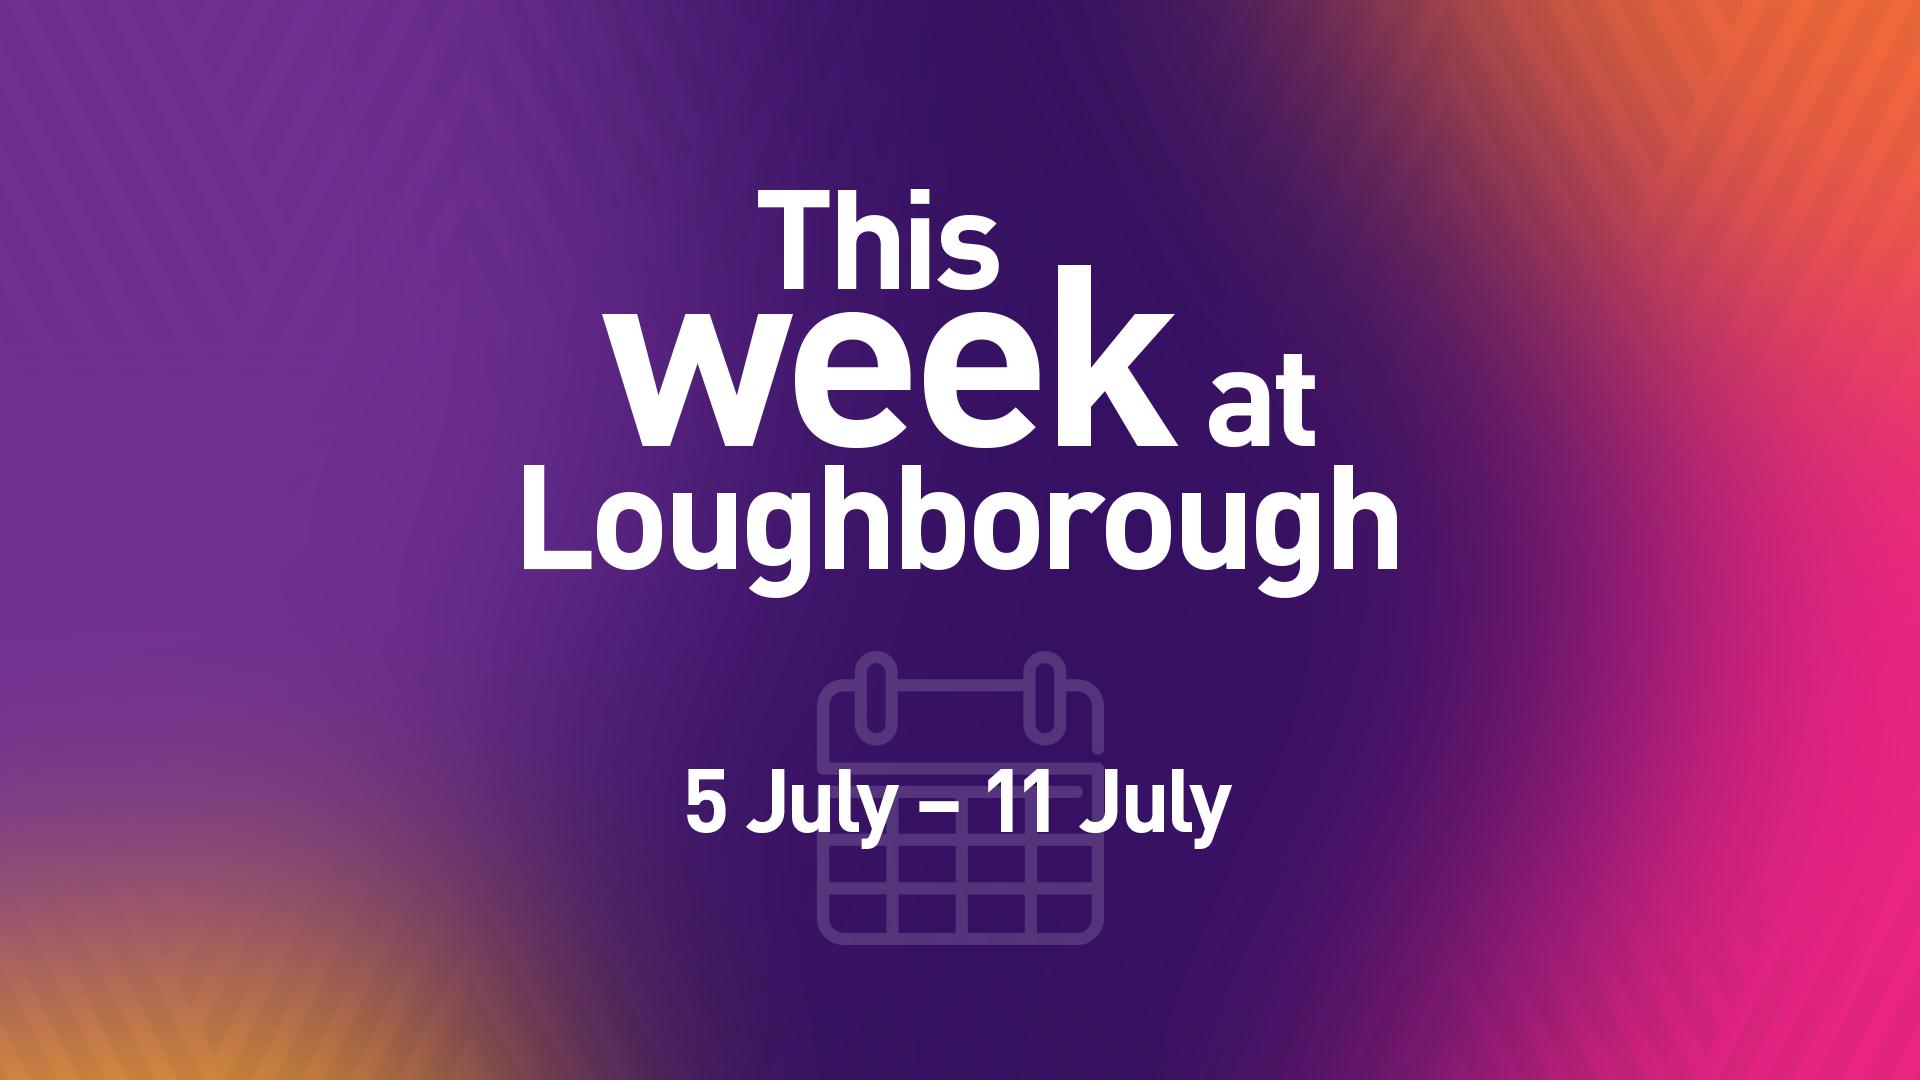 This Week at Loughborough | 5 July